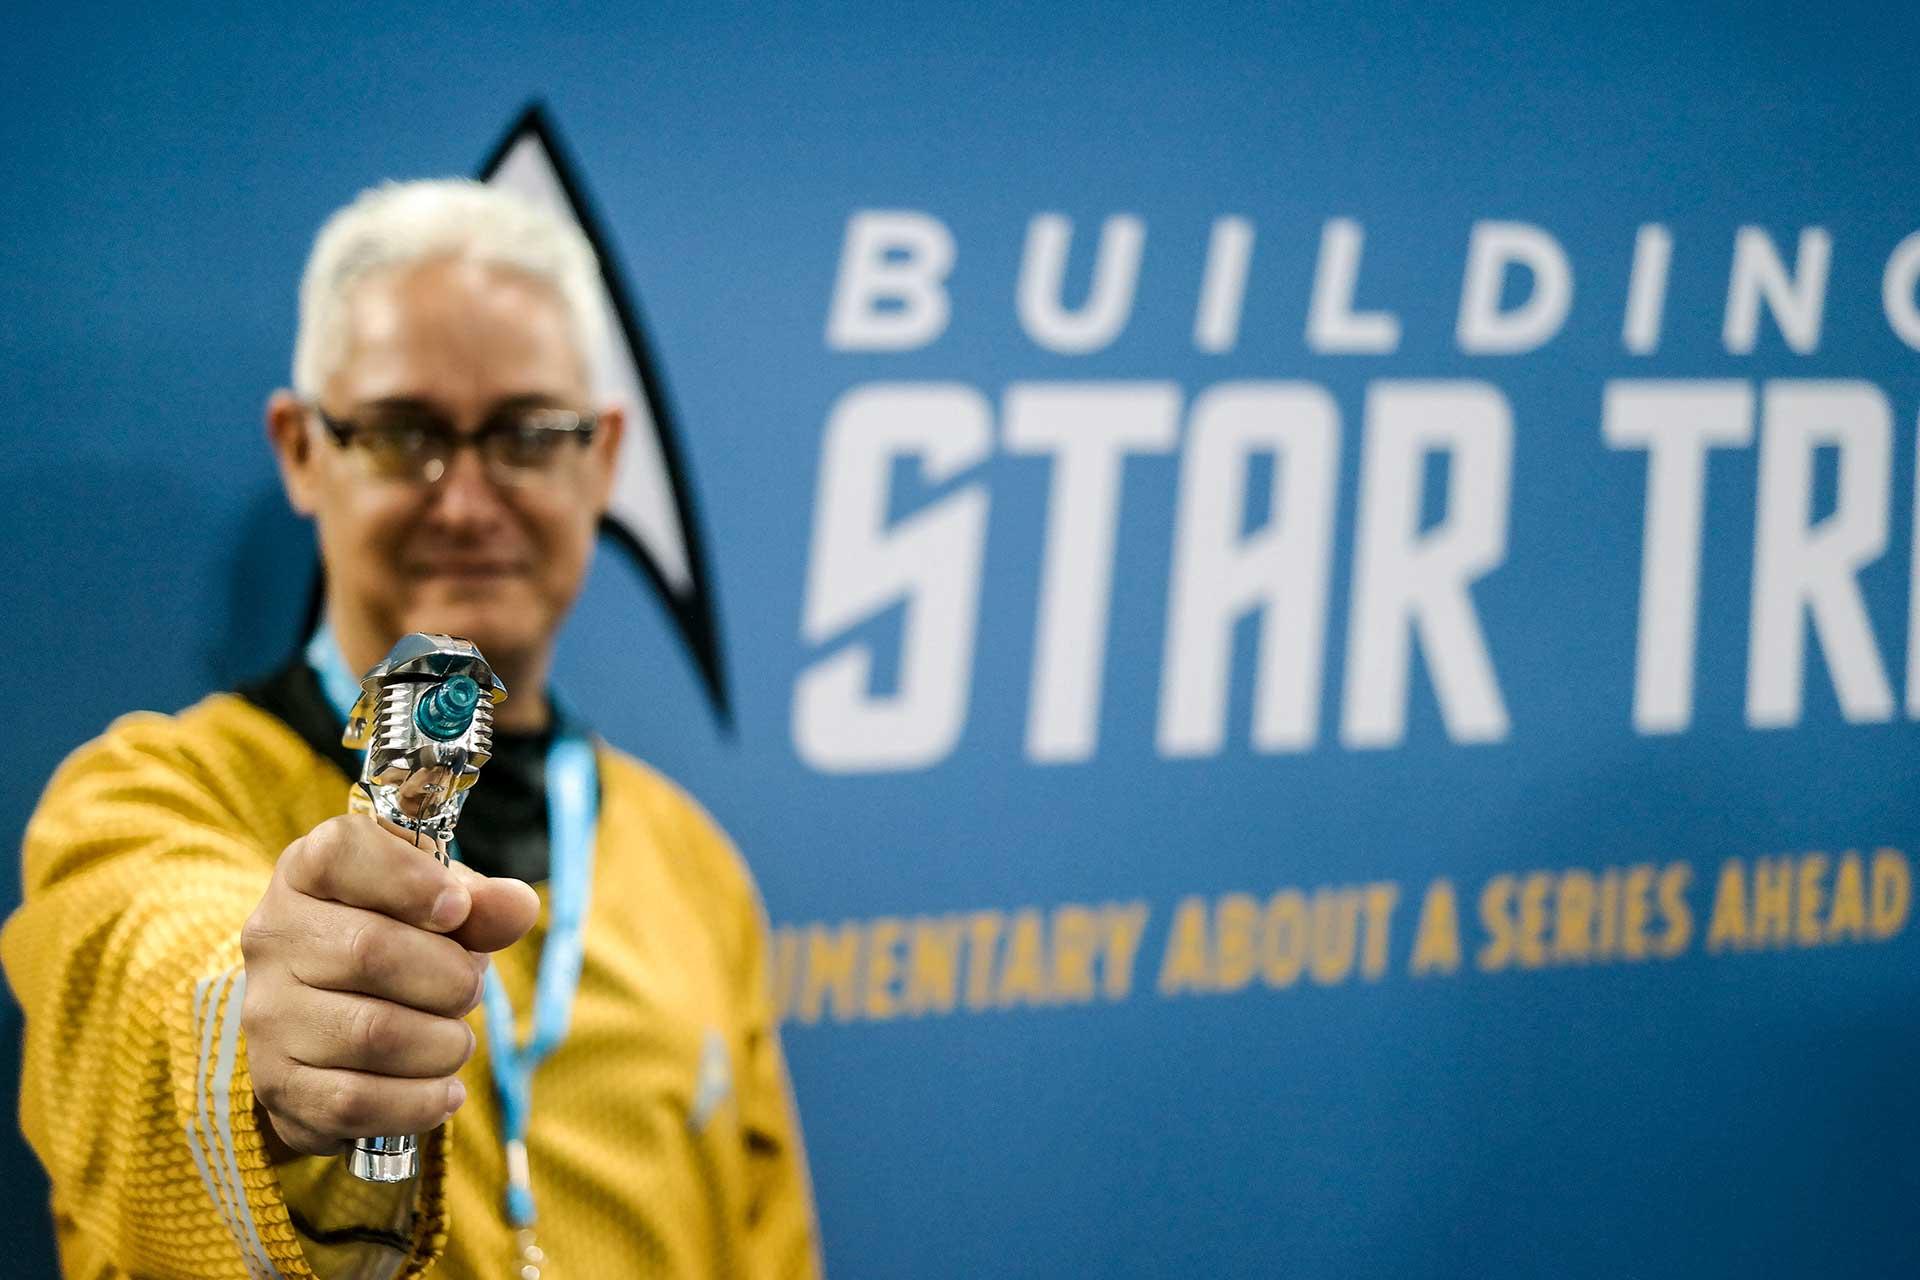 Guy with Start Trek costume